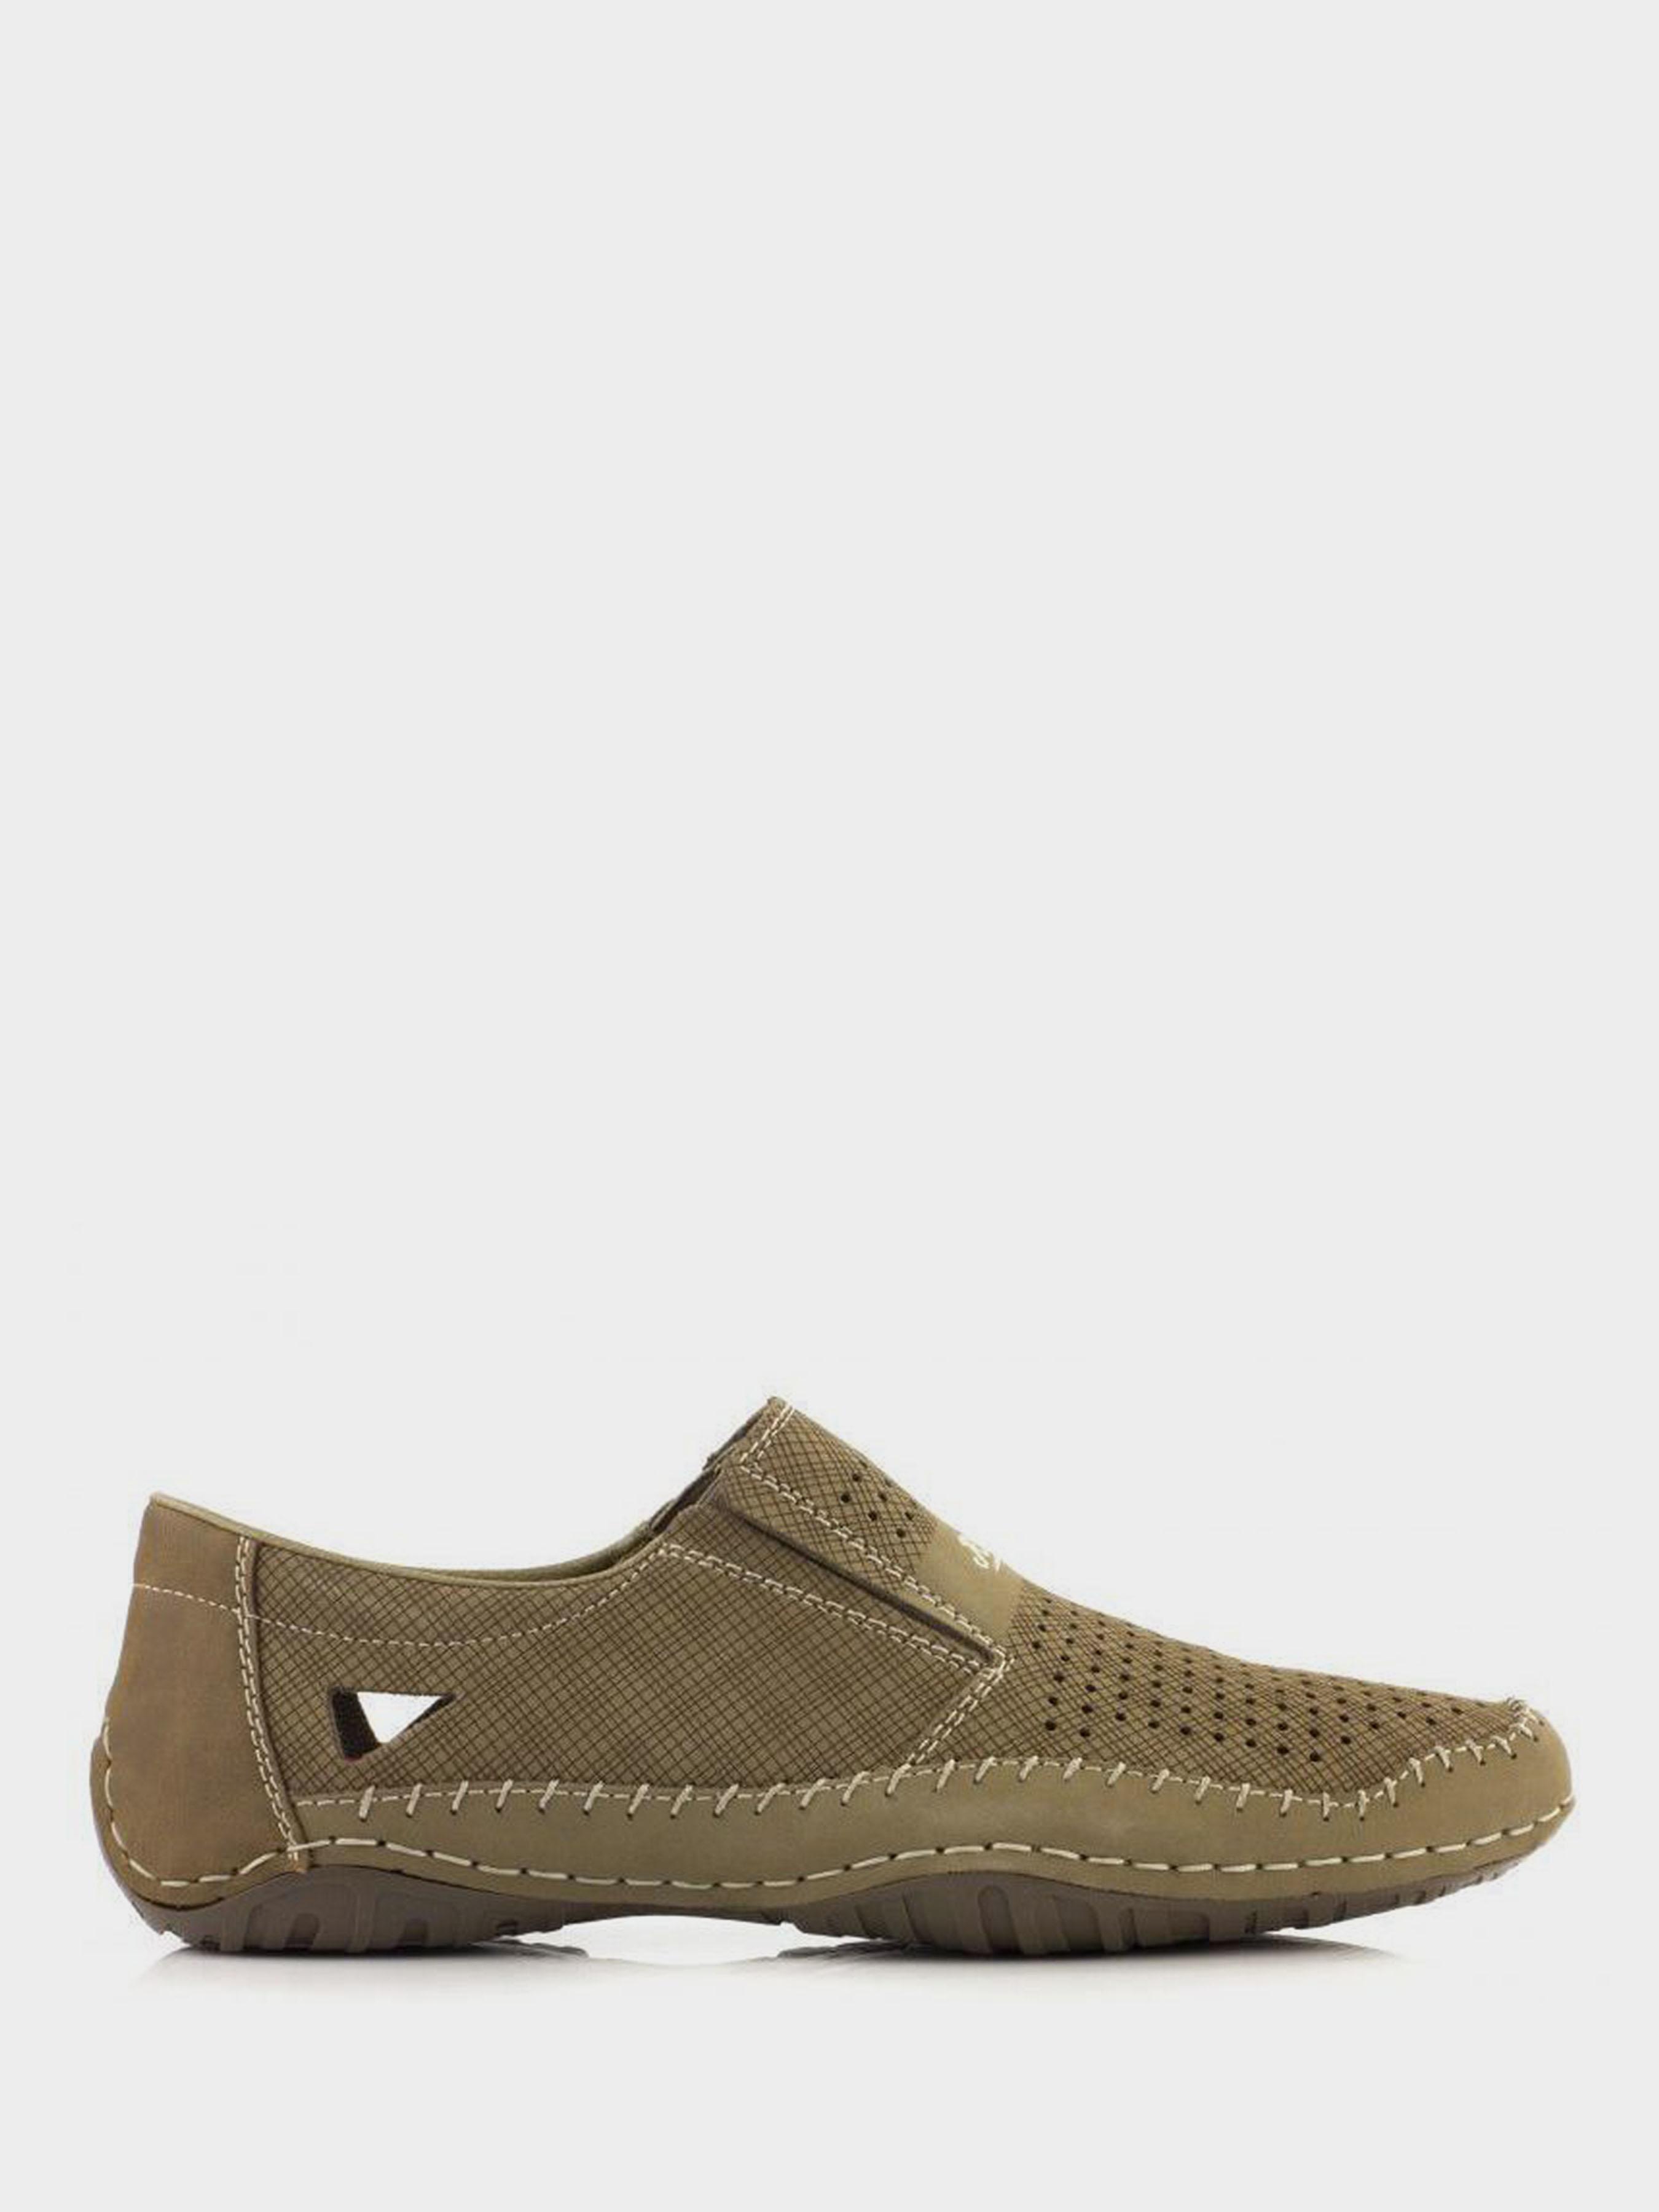 Полуботинки для мужчин RIEKER RK470 размеры обуви, 2017